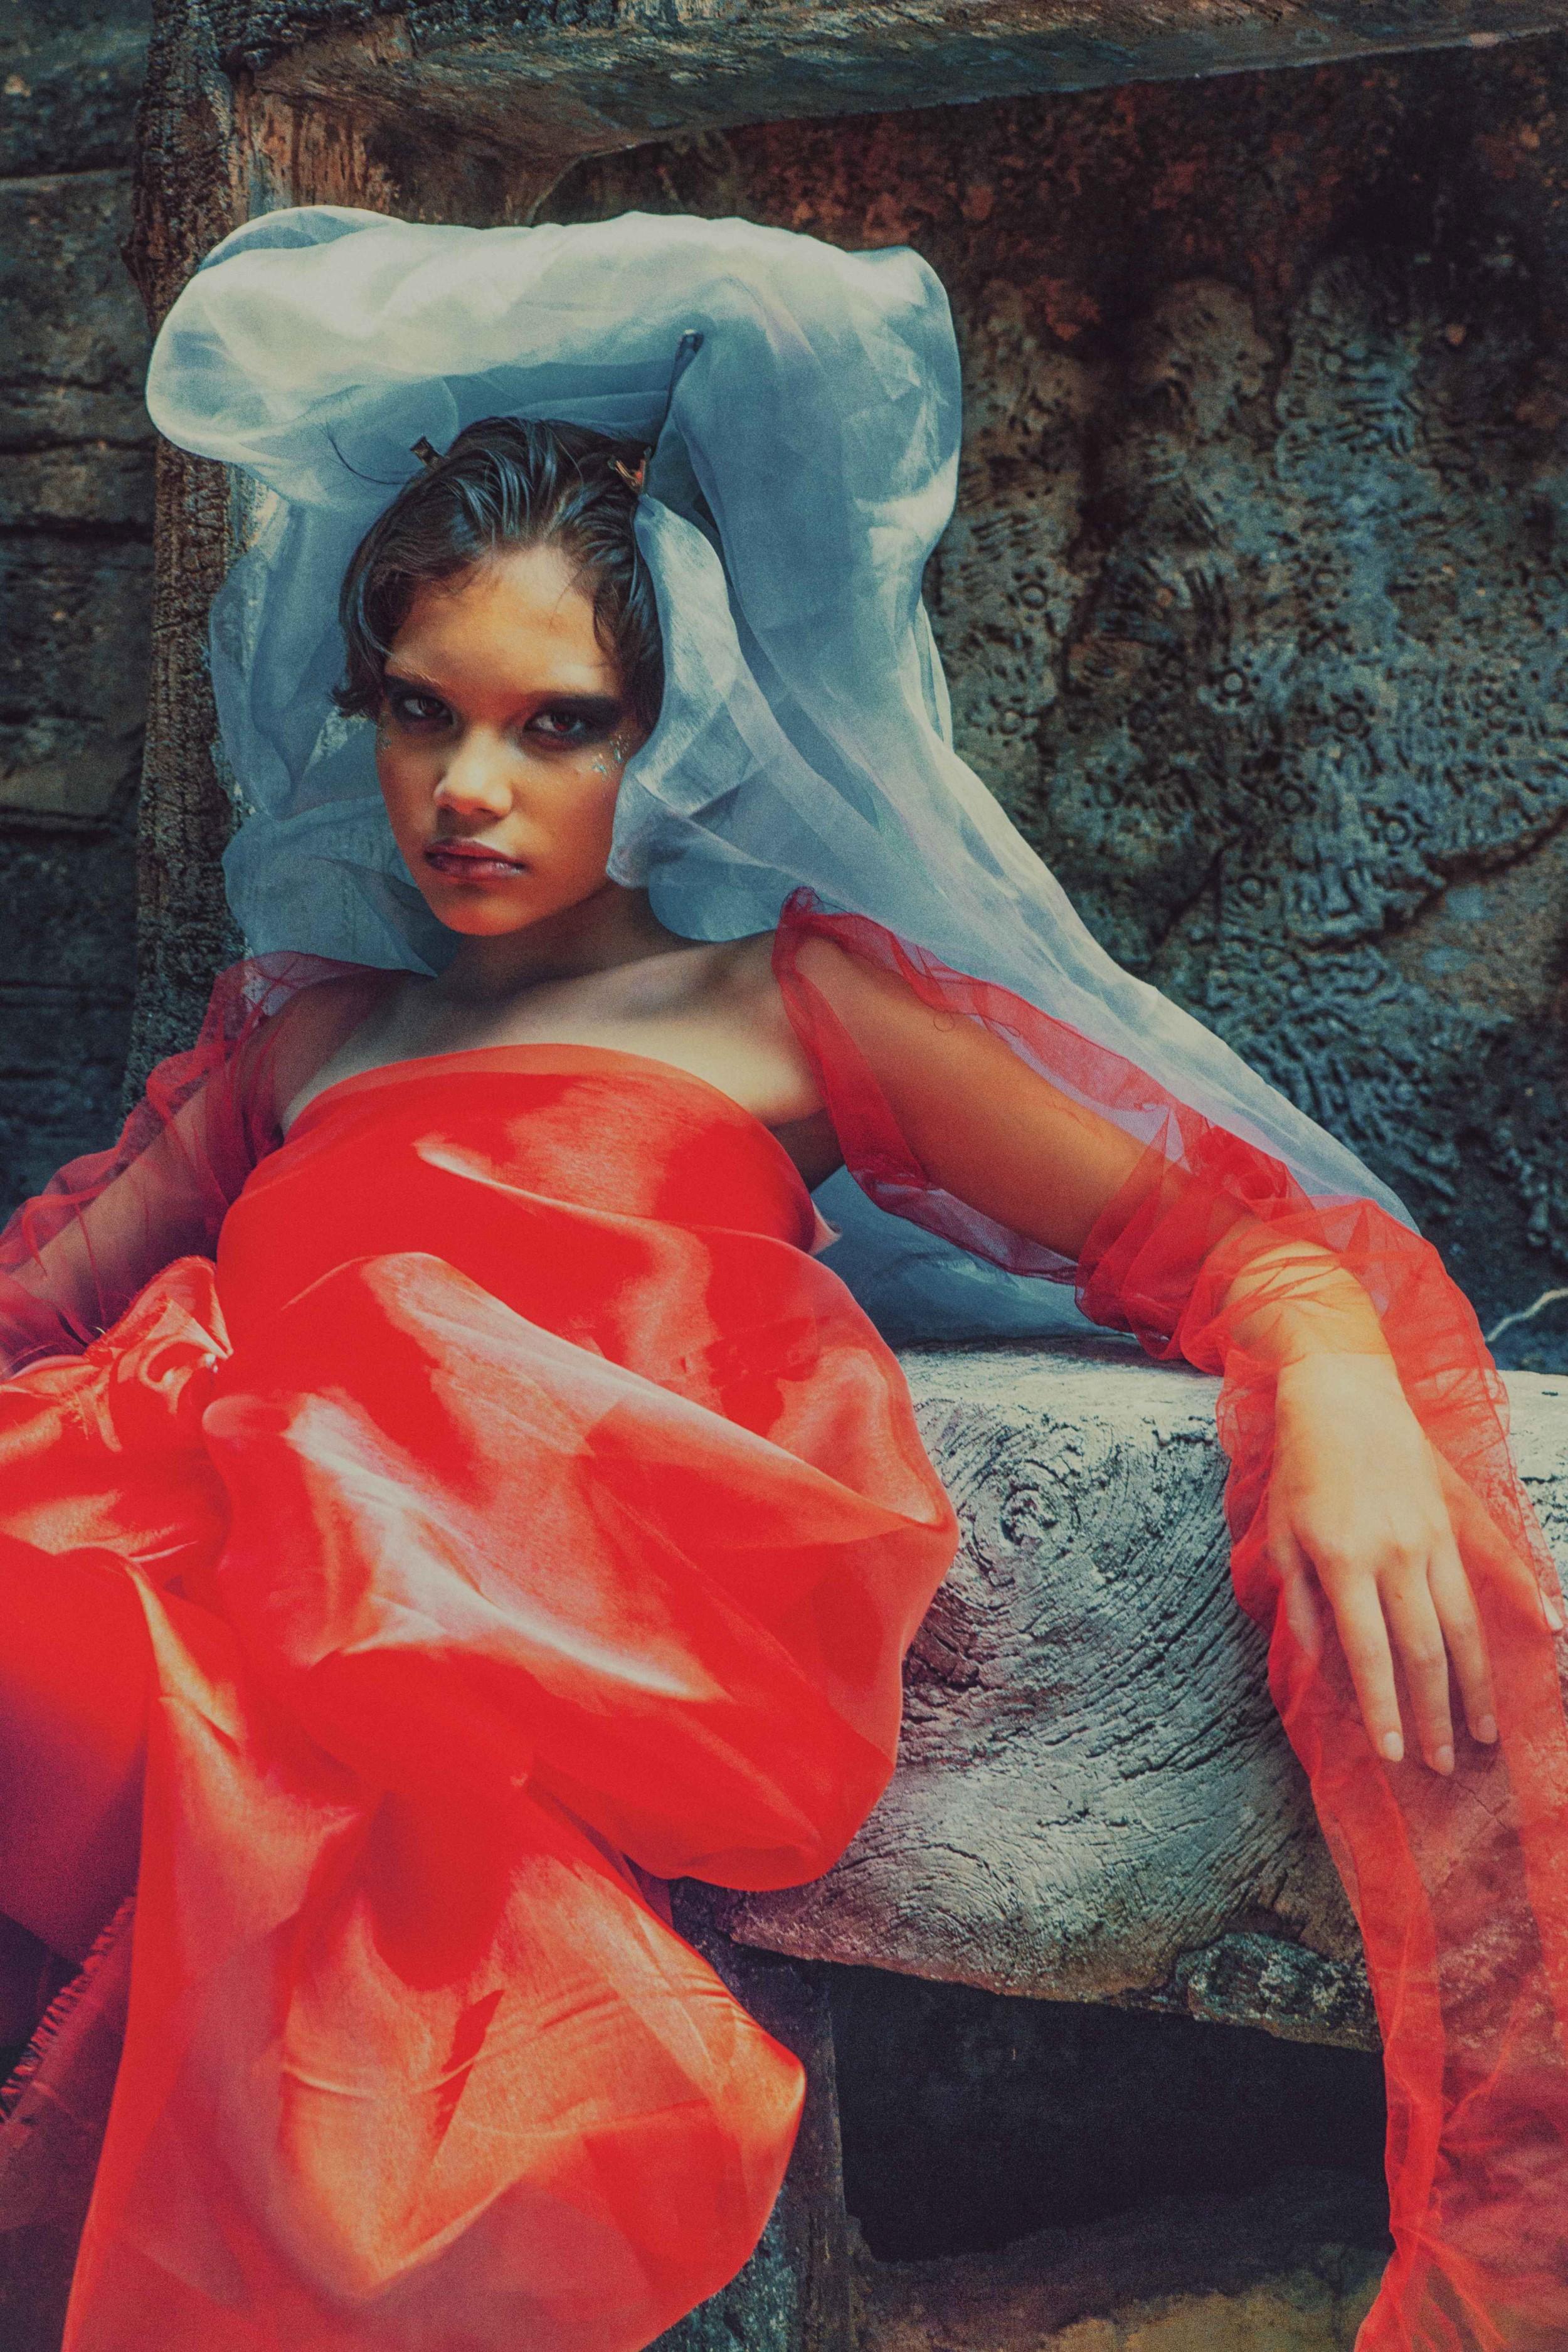 Indonesian Photographer Bintang Adamas 'Shakira' Series for Through the Photographer's Lens, Globetroter Magazine (13).jpg